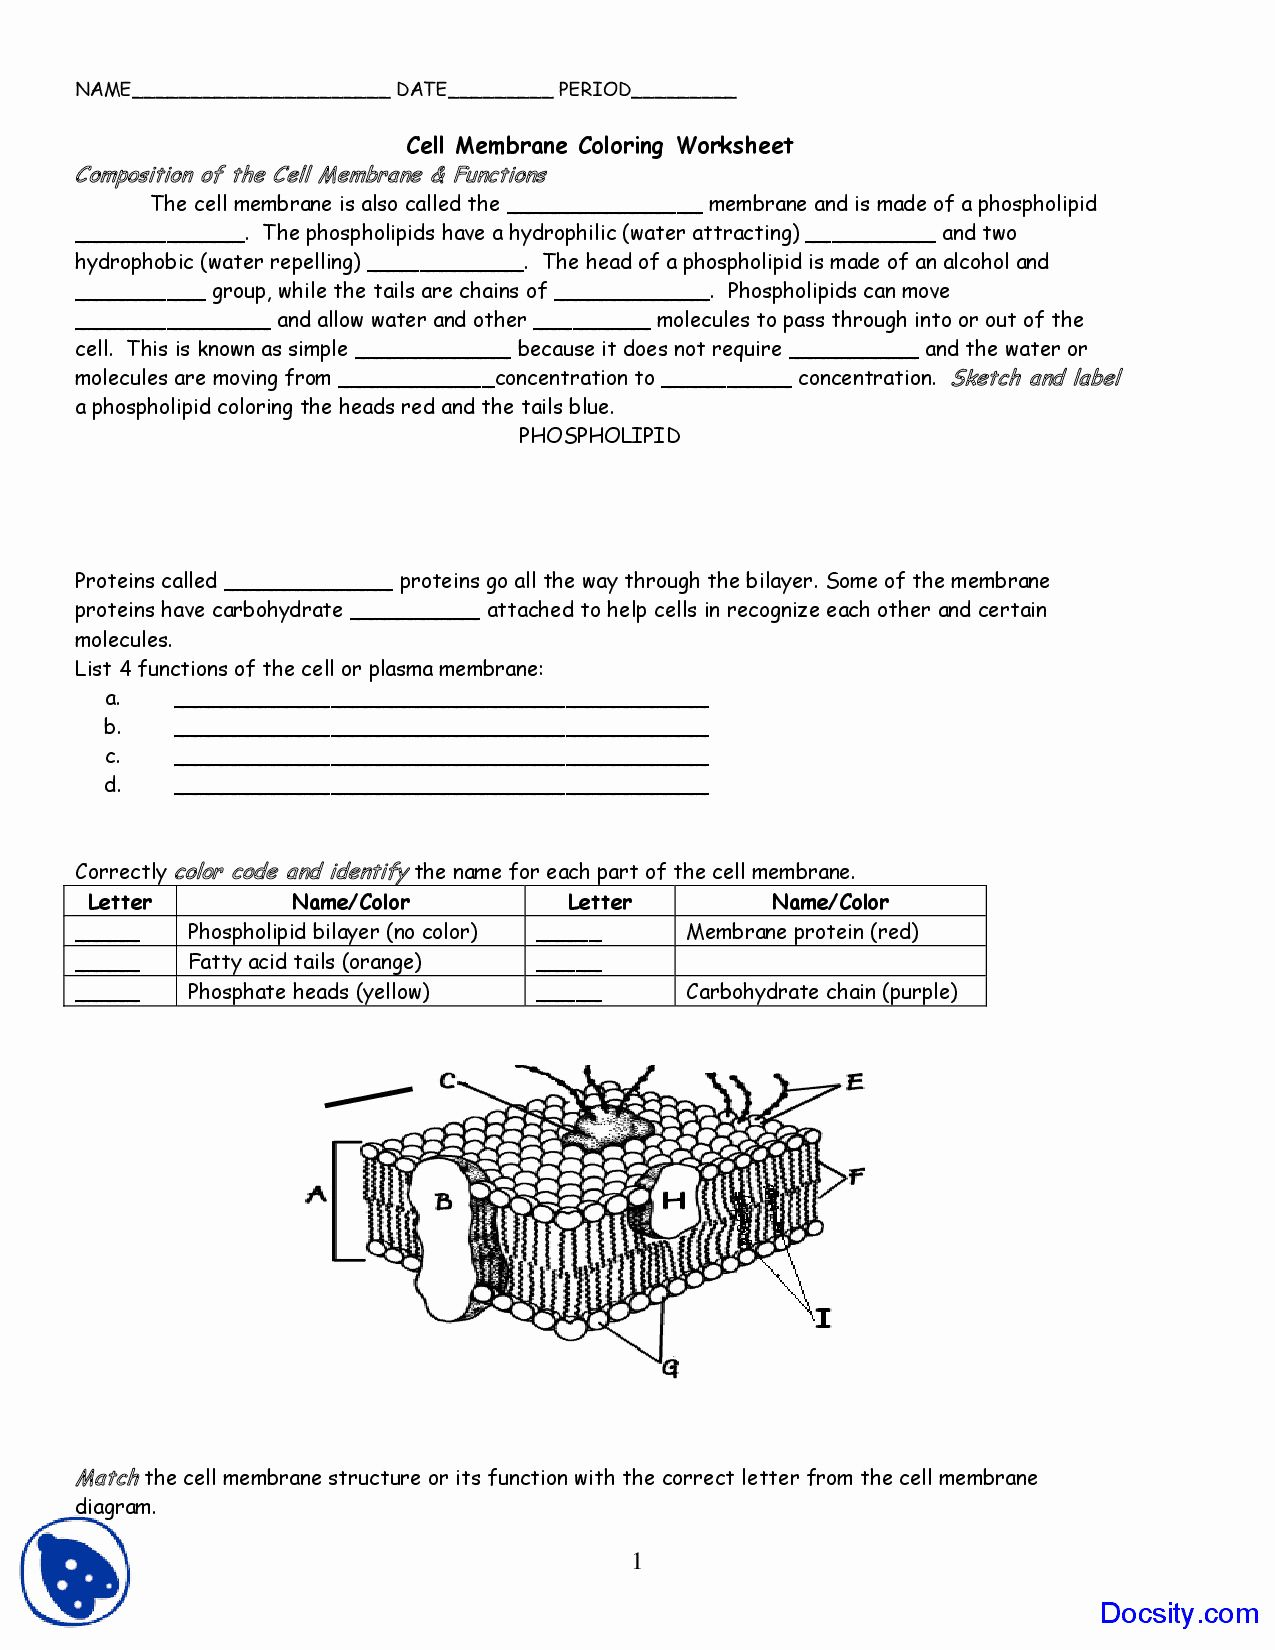 31 Cell Membrane Coloring Worksheet Key